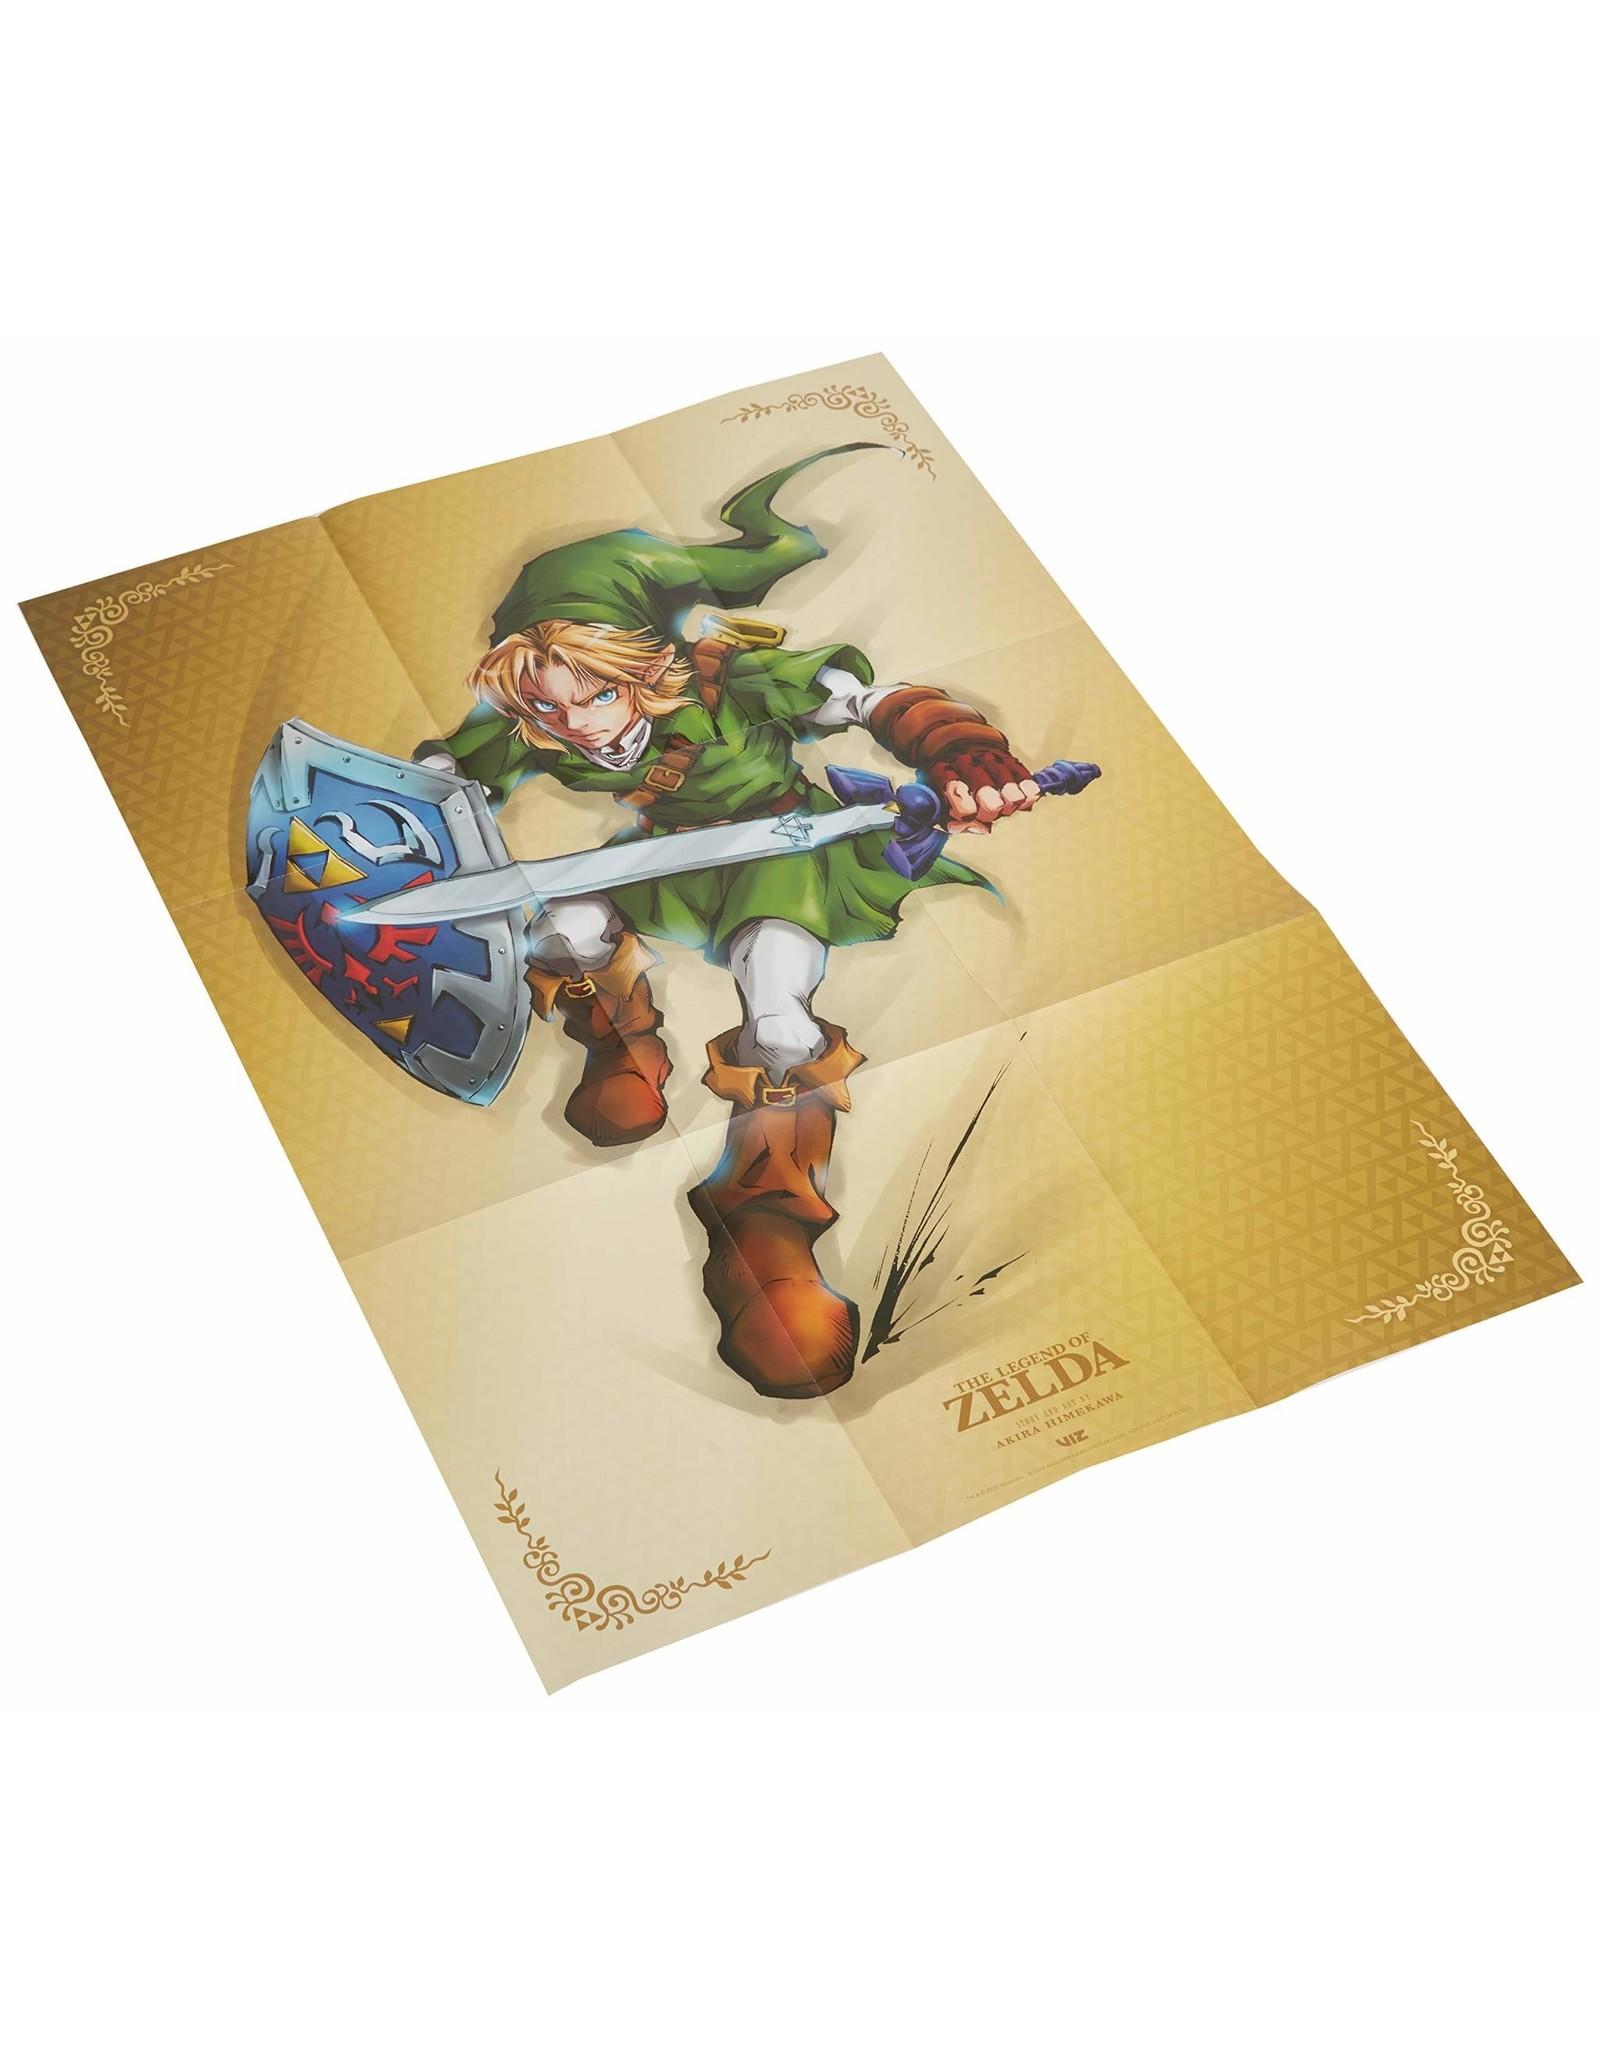 The Legend of Zelda: Legendary Edition Box Set (English)